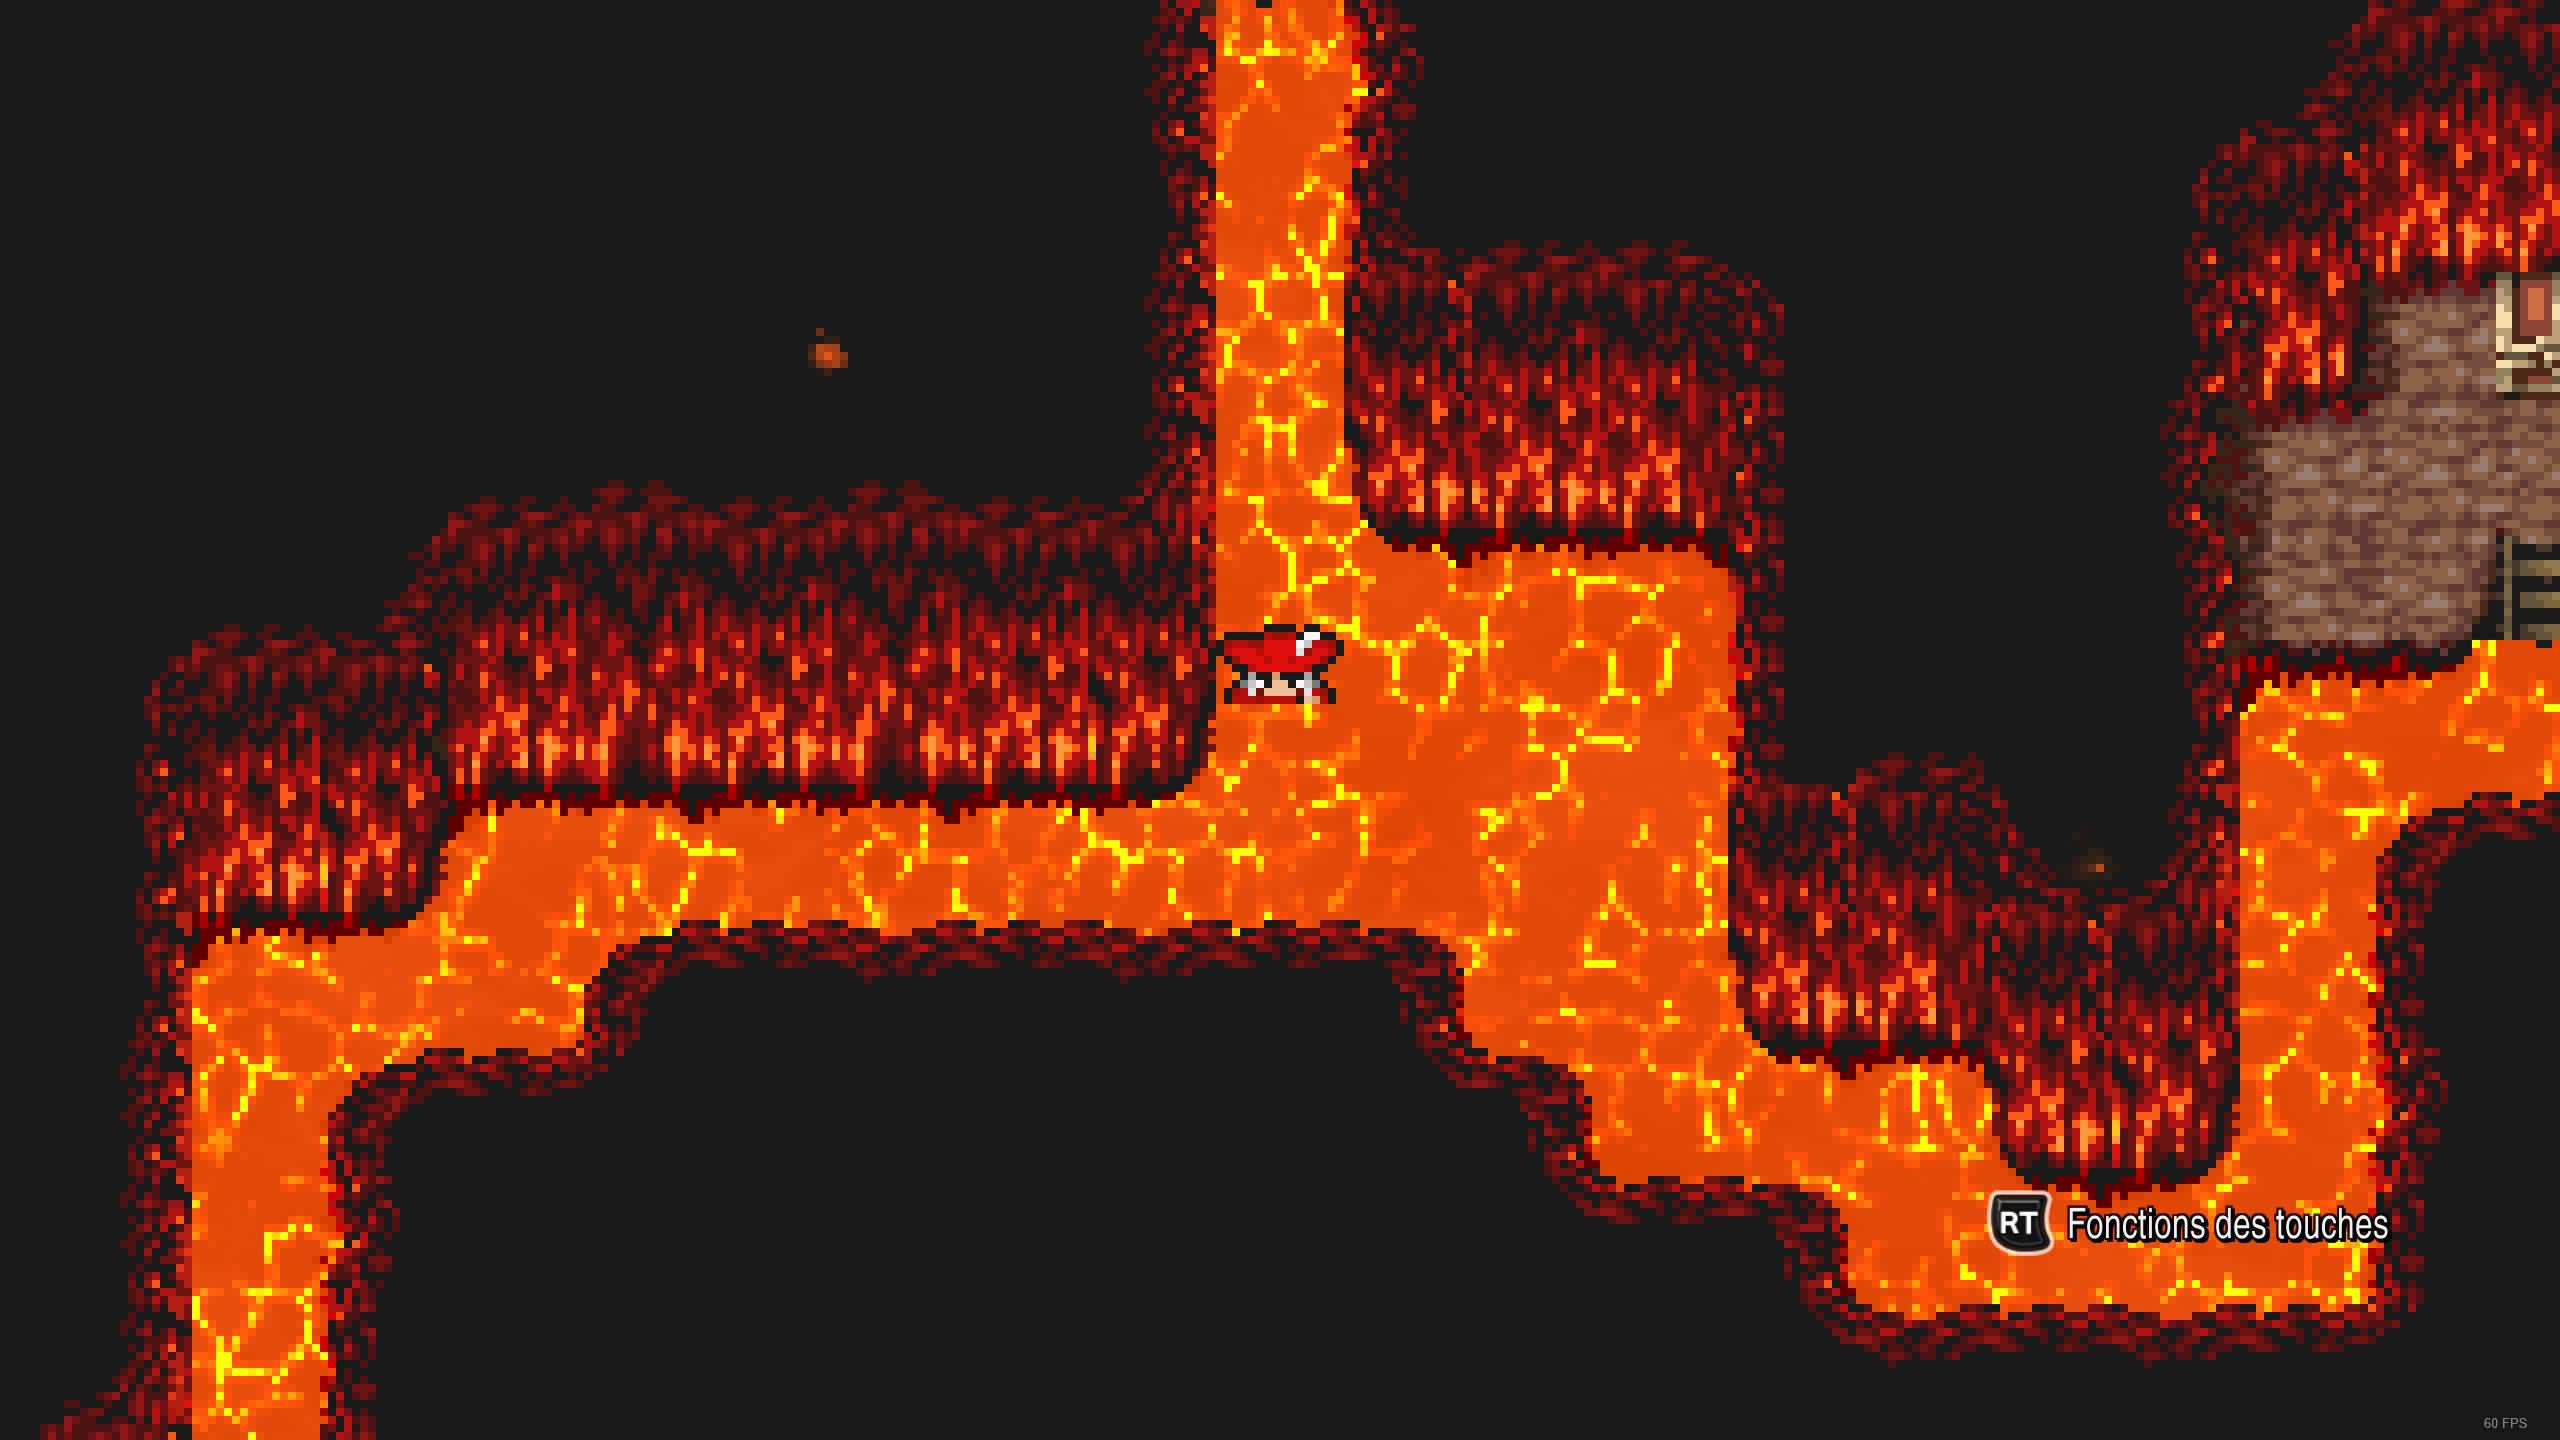 FINAL_FANTASY_III Lava